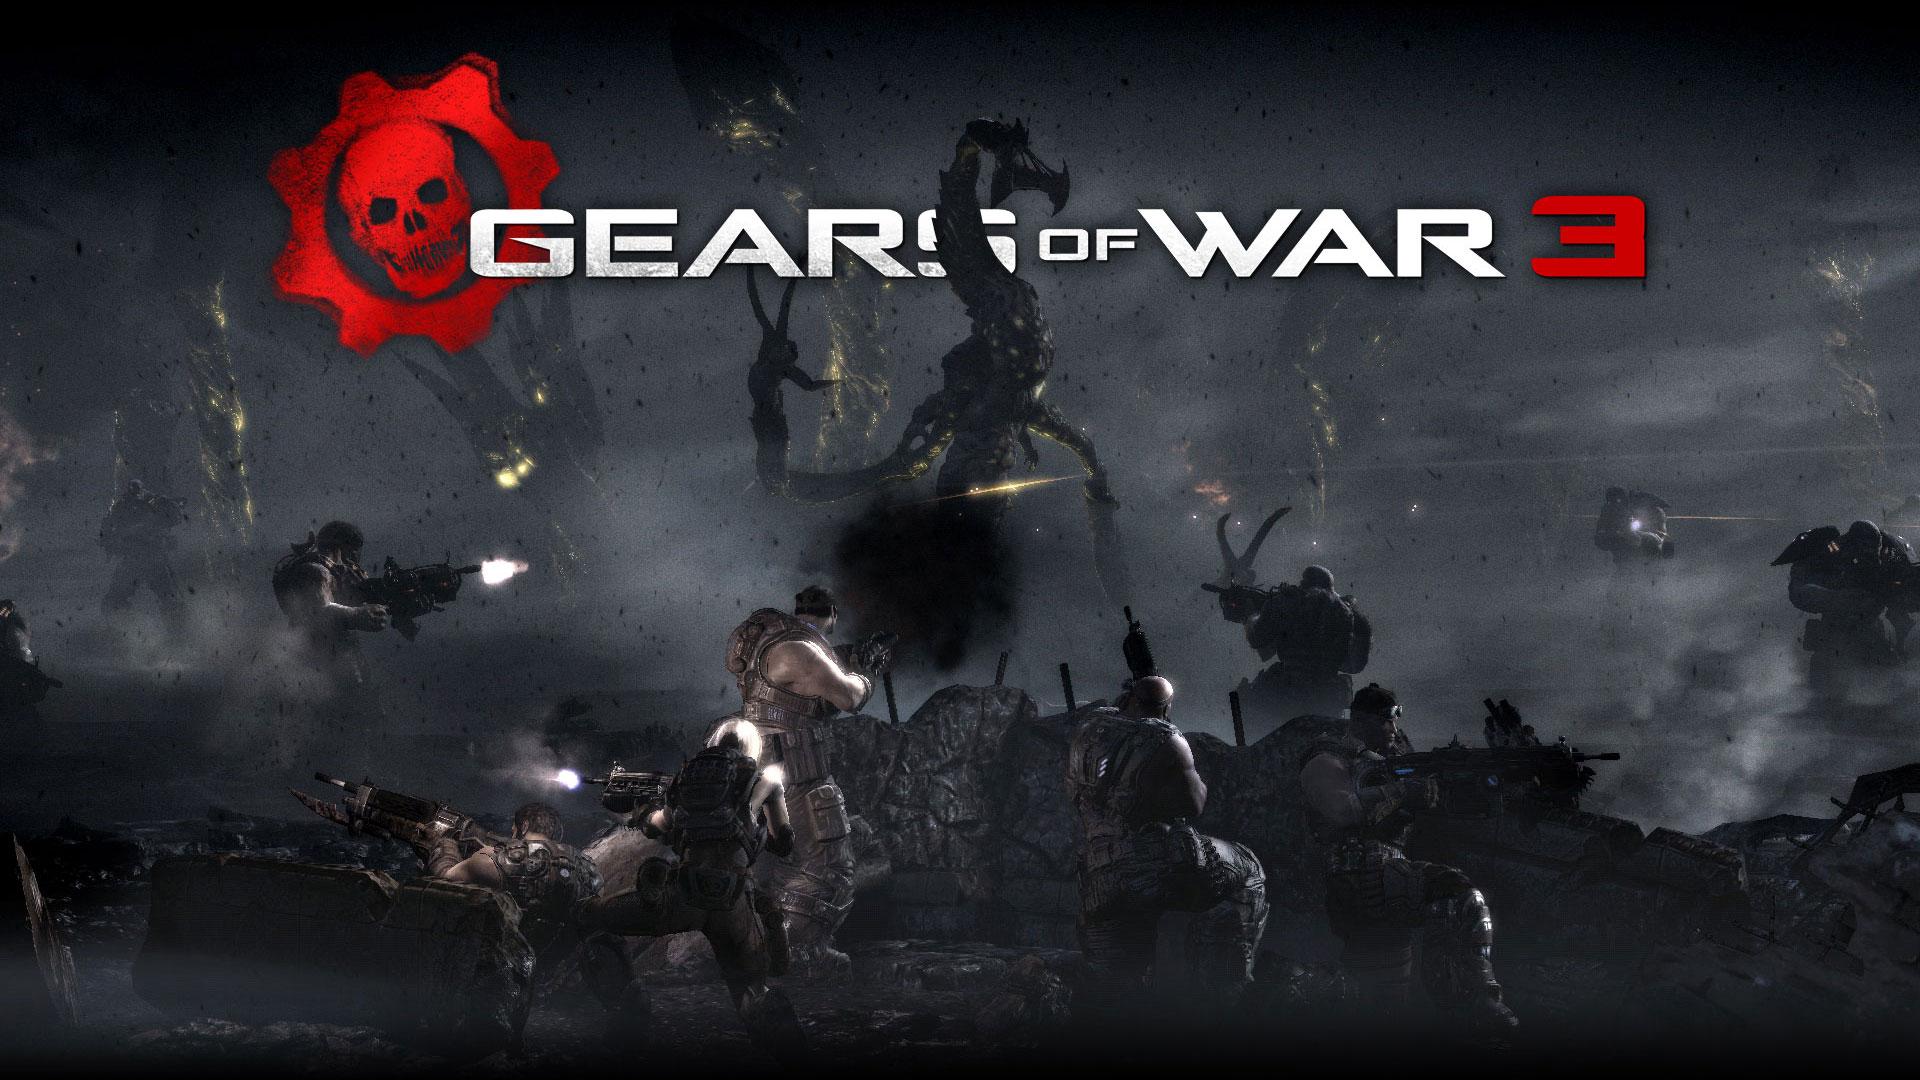 49 Gears Of War Wallpaper 1080p On Wallpapersafari